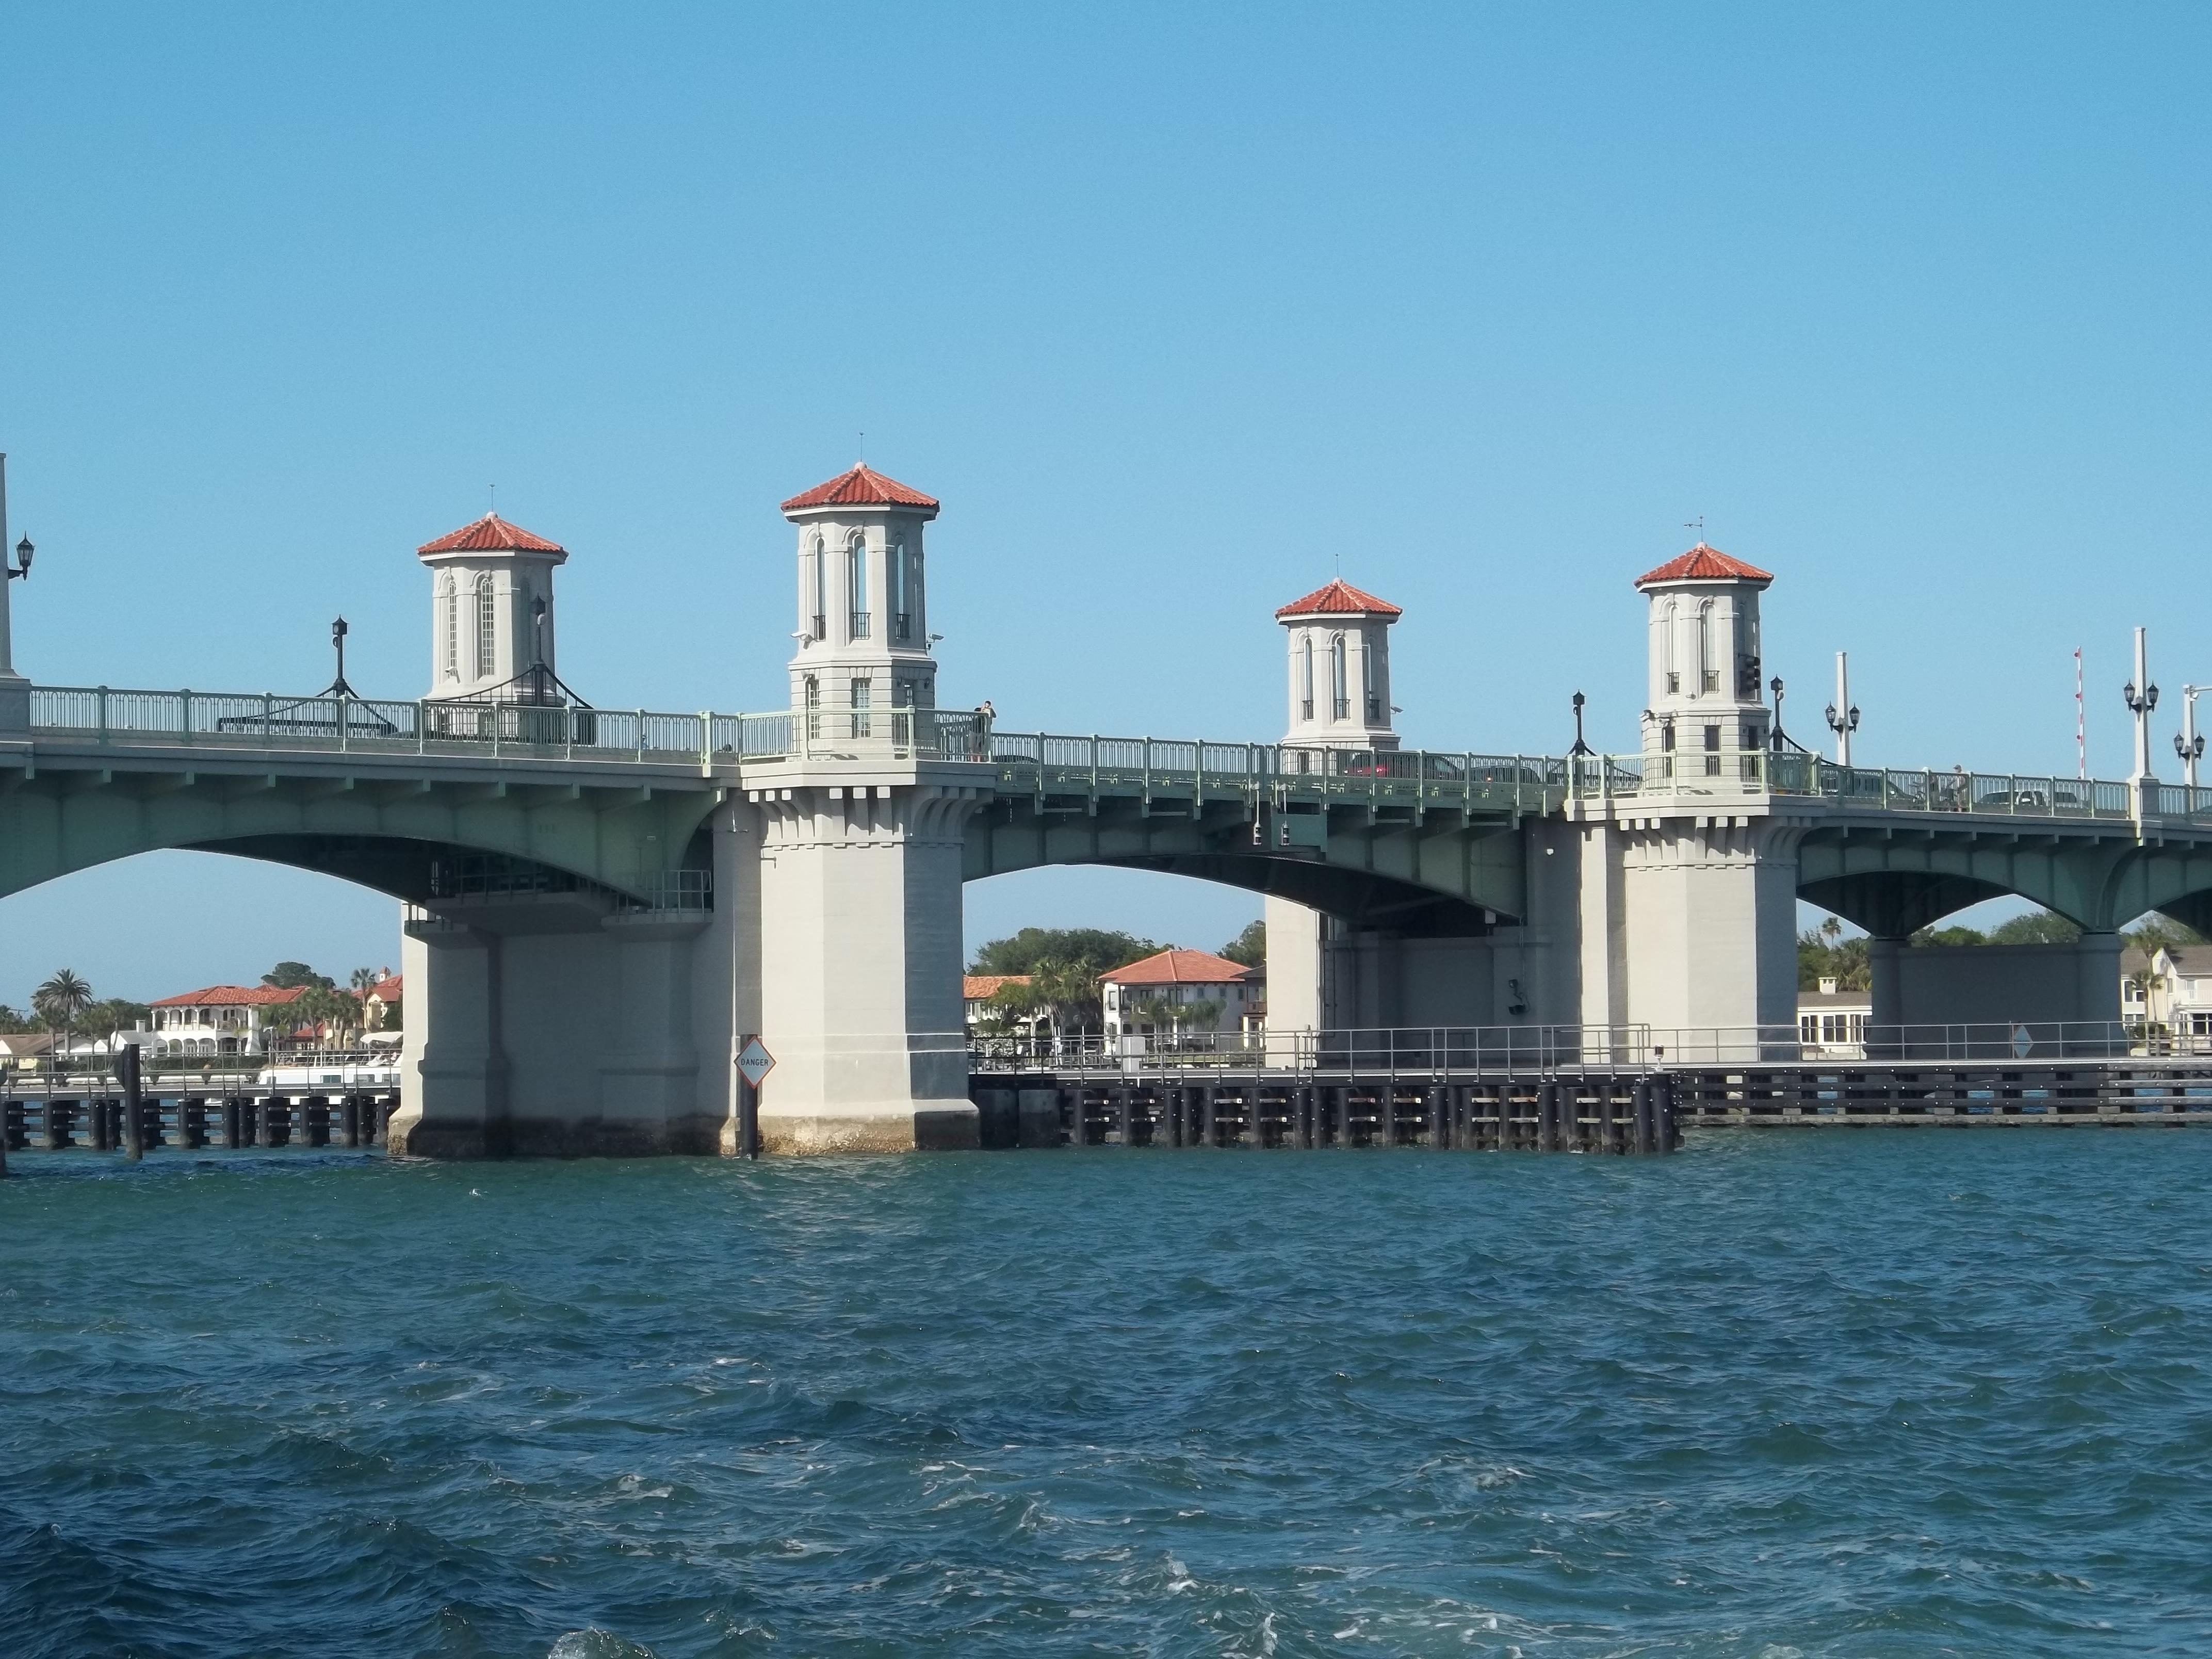 Treasure Island Florida Condos For Sale With Boat Slip